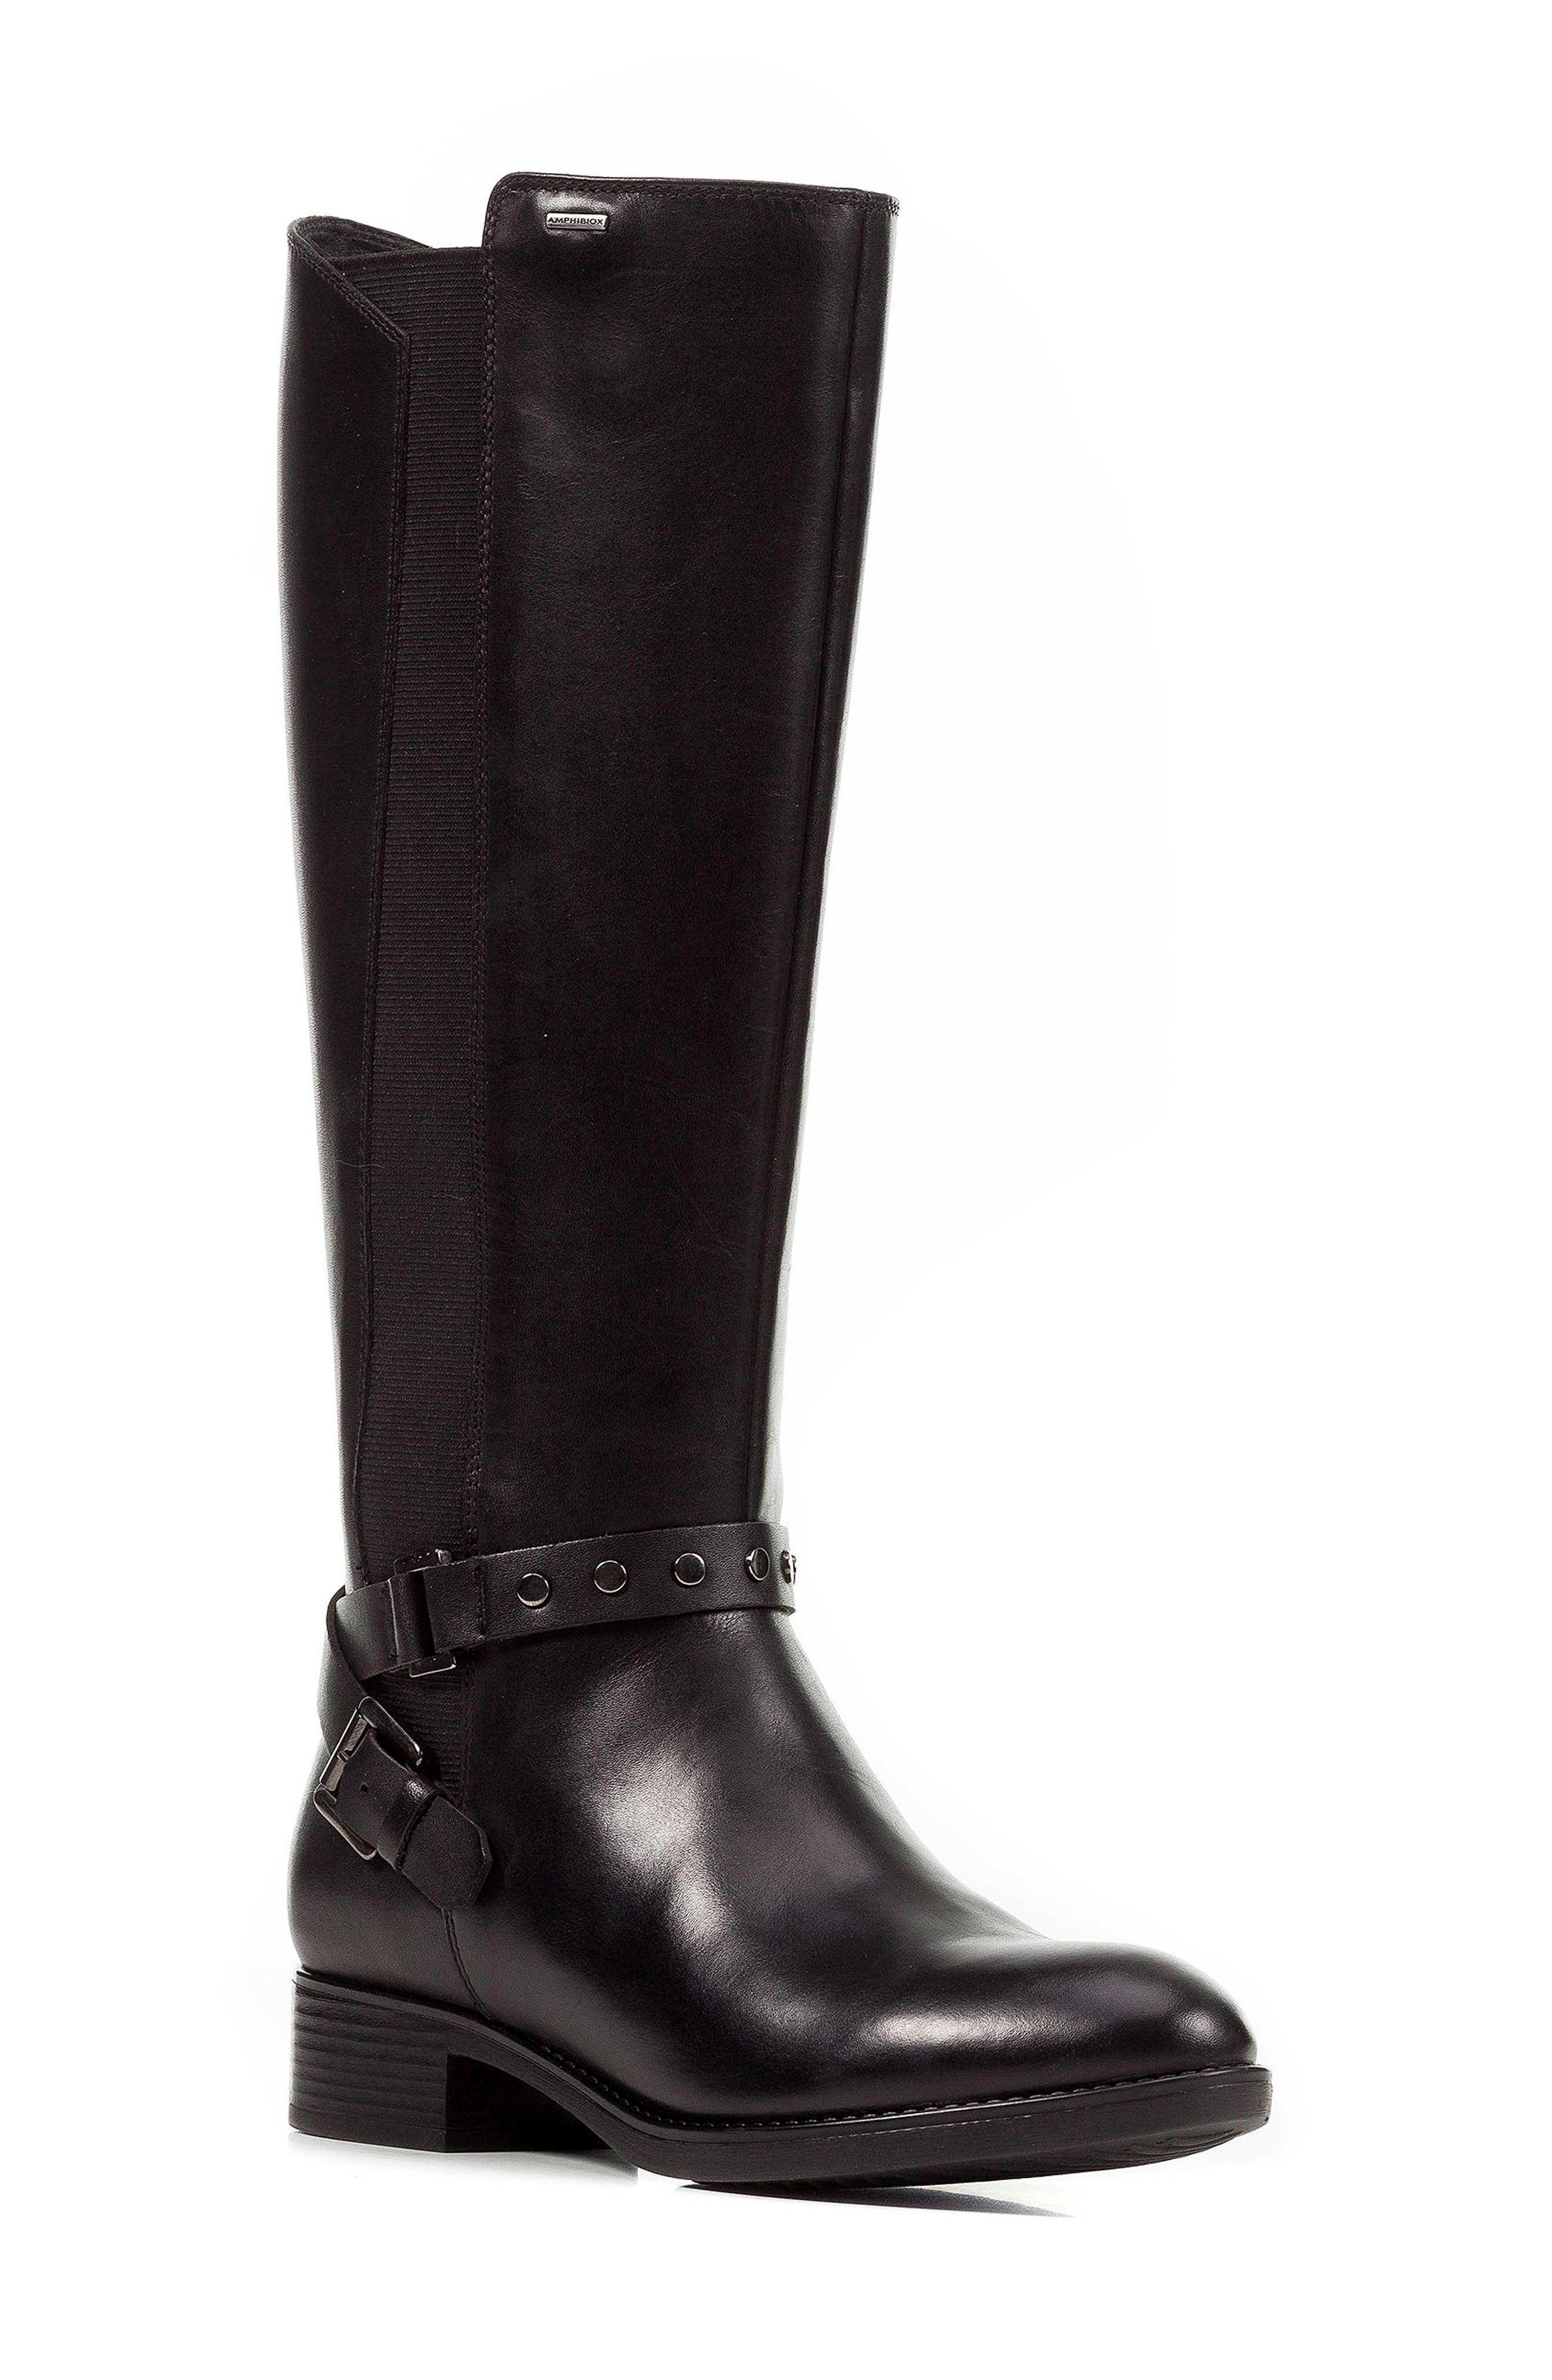 Geox Felicity Abx Waterproof Knee High Riding Boot